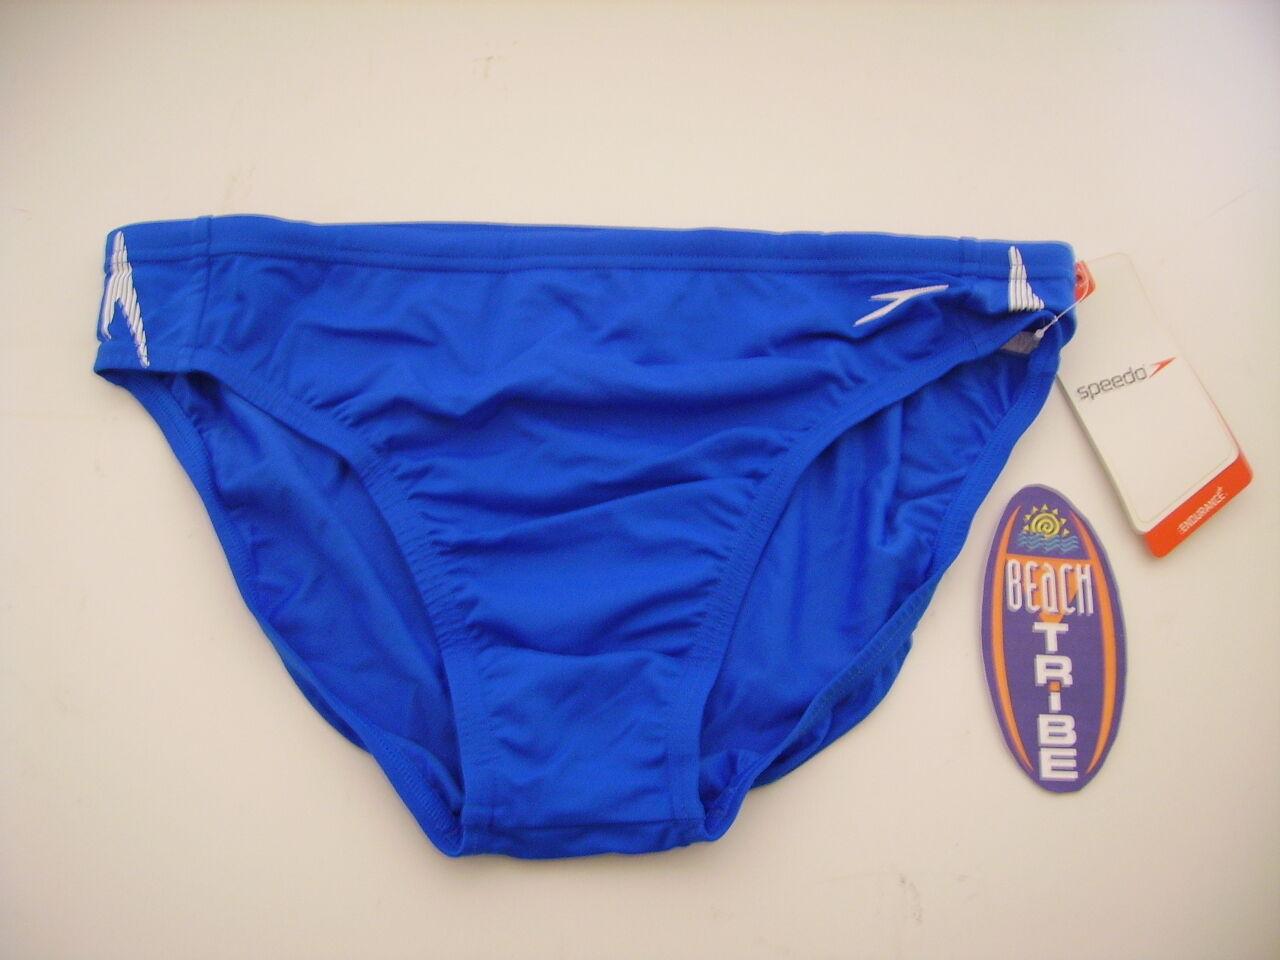 SPEEDO COSTUME SLIP SWIMSUIT POOLS 056206357 ENDURANCE AZZURRO blue TURCHESE 56